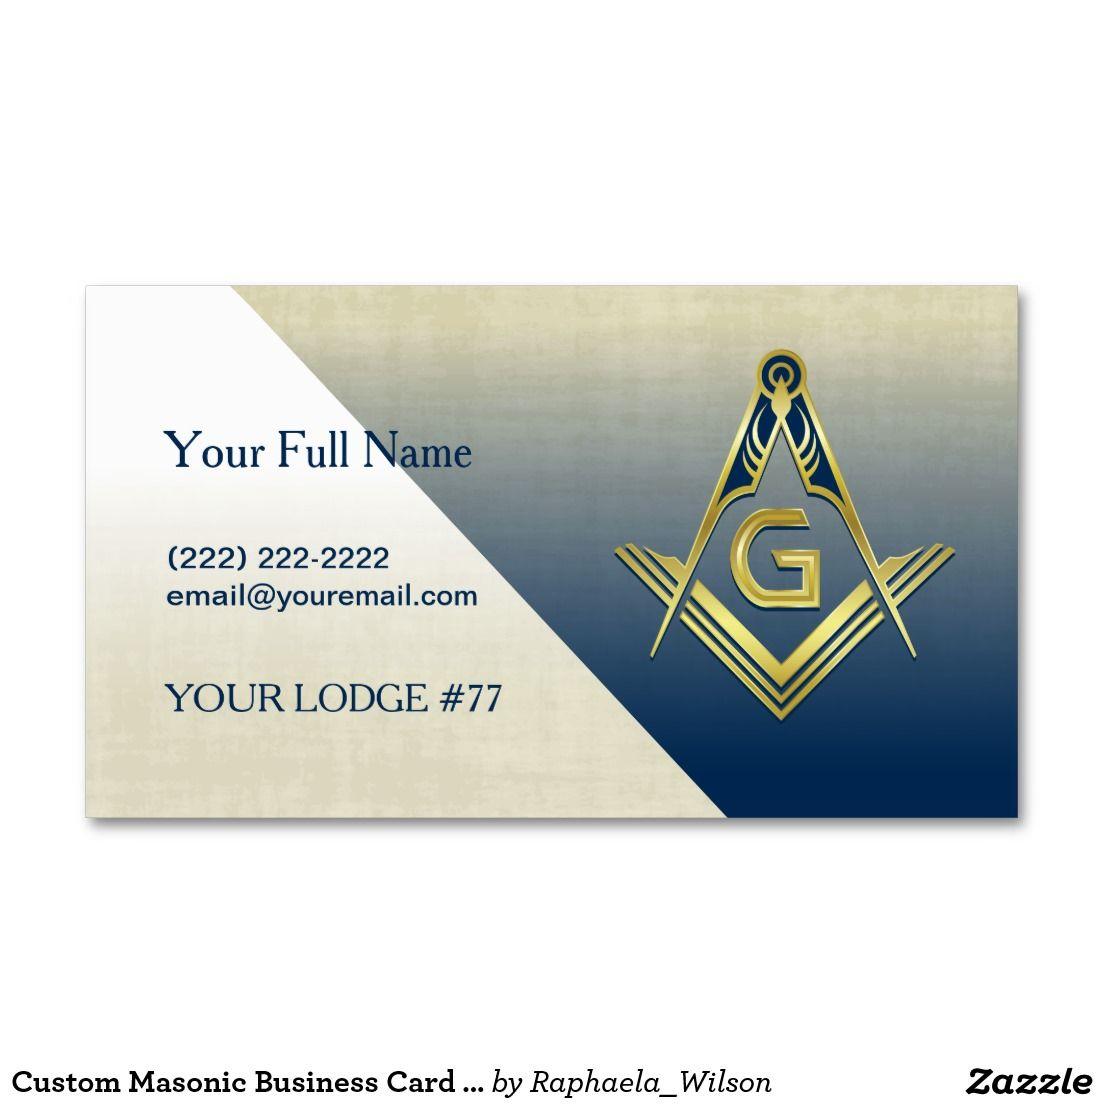 Navy Blue Gold Masonic Business Card Template | Zazzle com | Custom